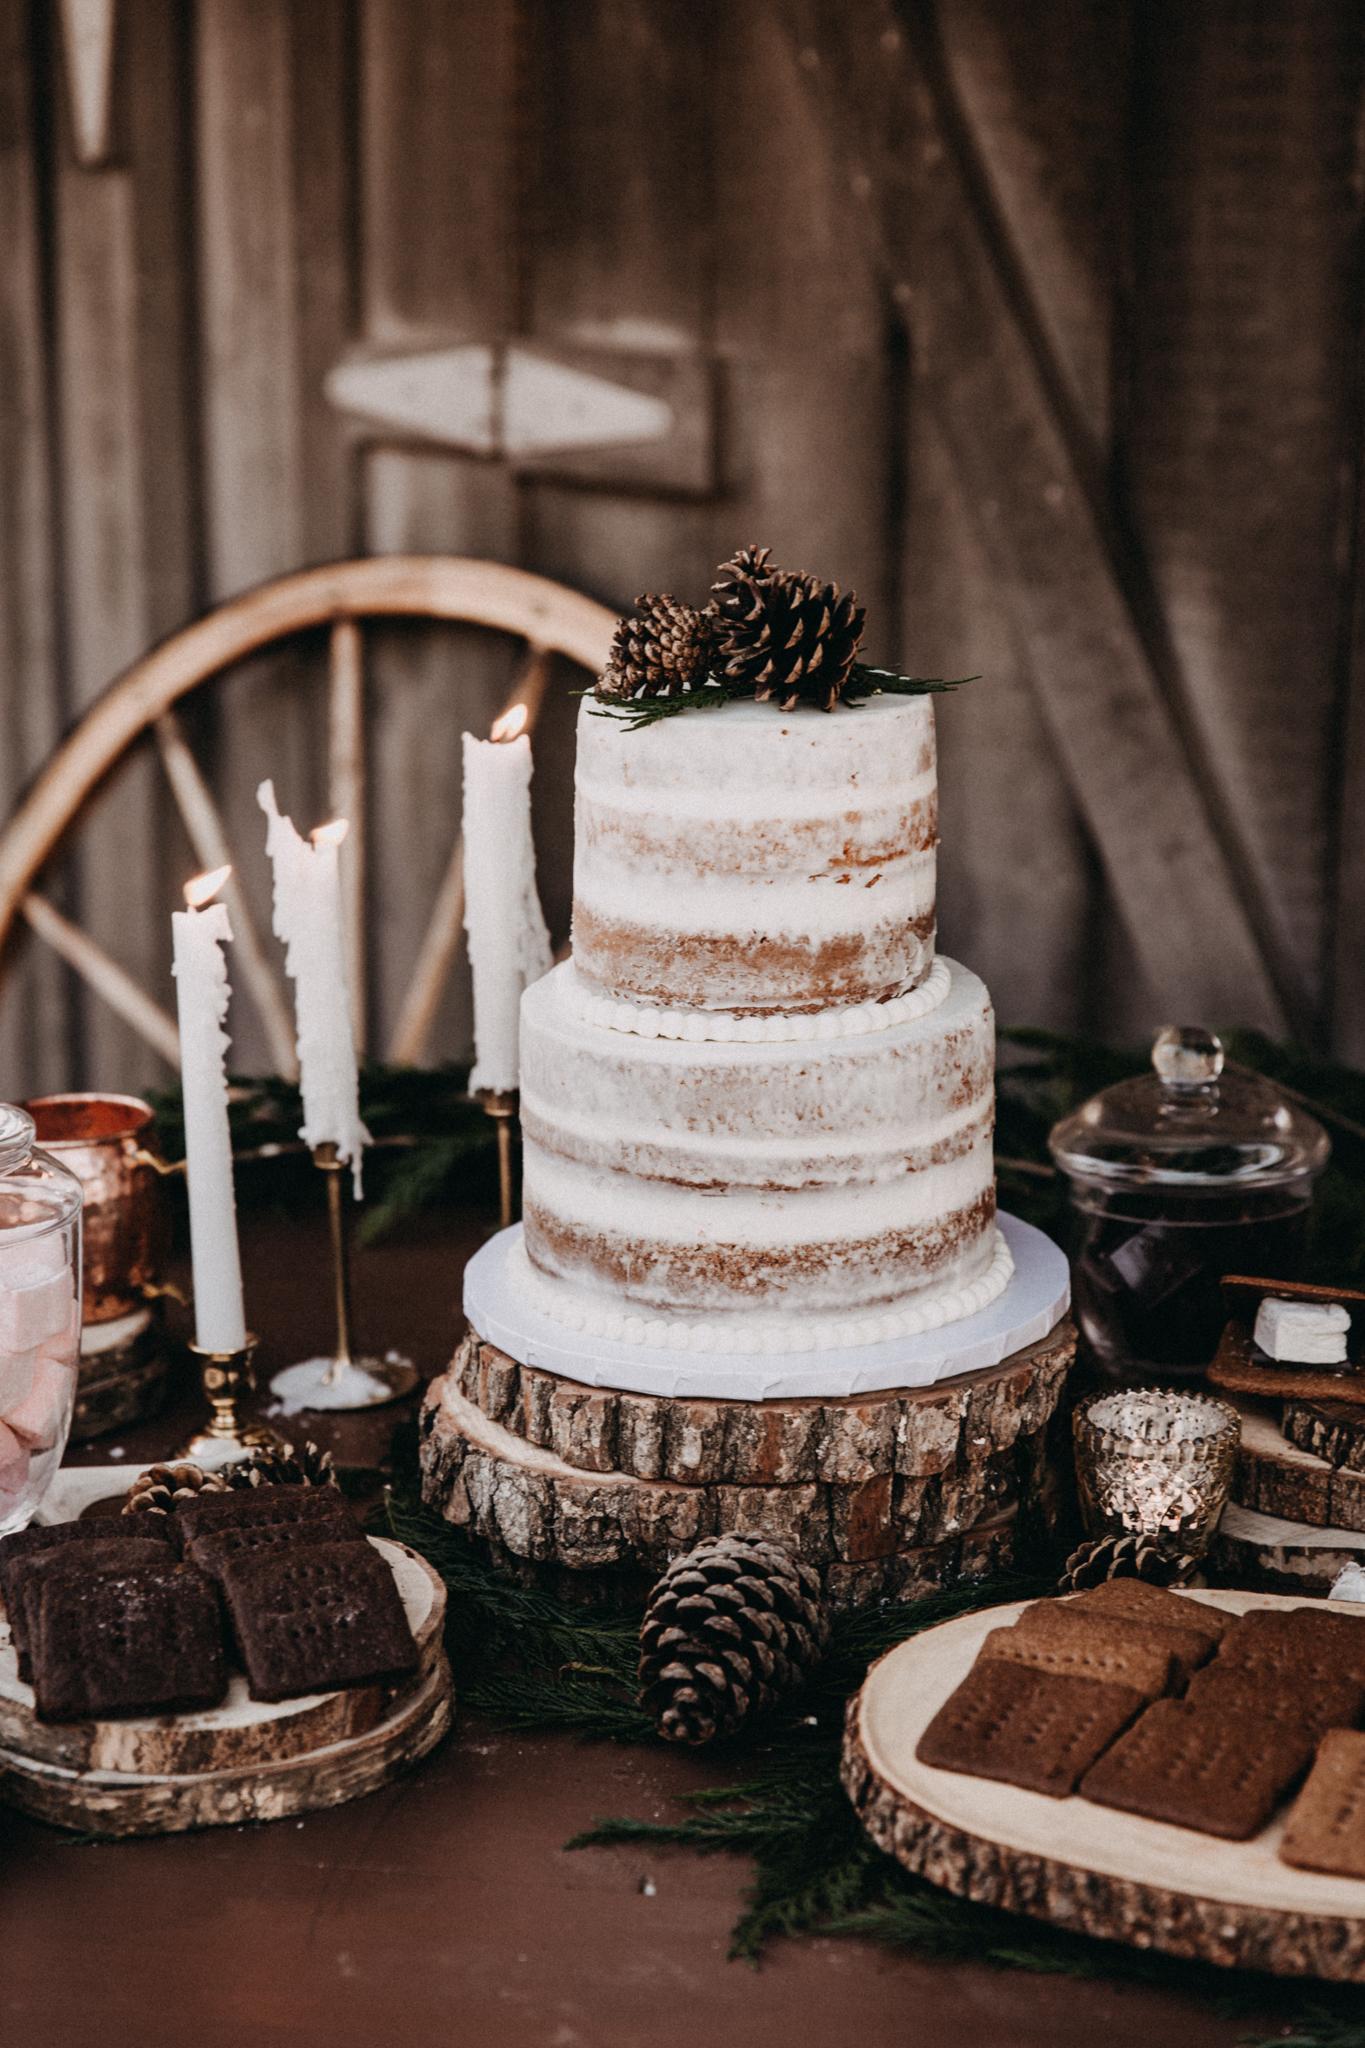 MonicaLeavellPhoto-North-Georgia-Intimate-Winter-Wedding-Photographer-1.jpg